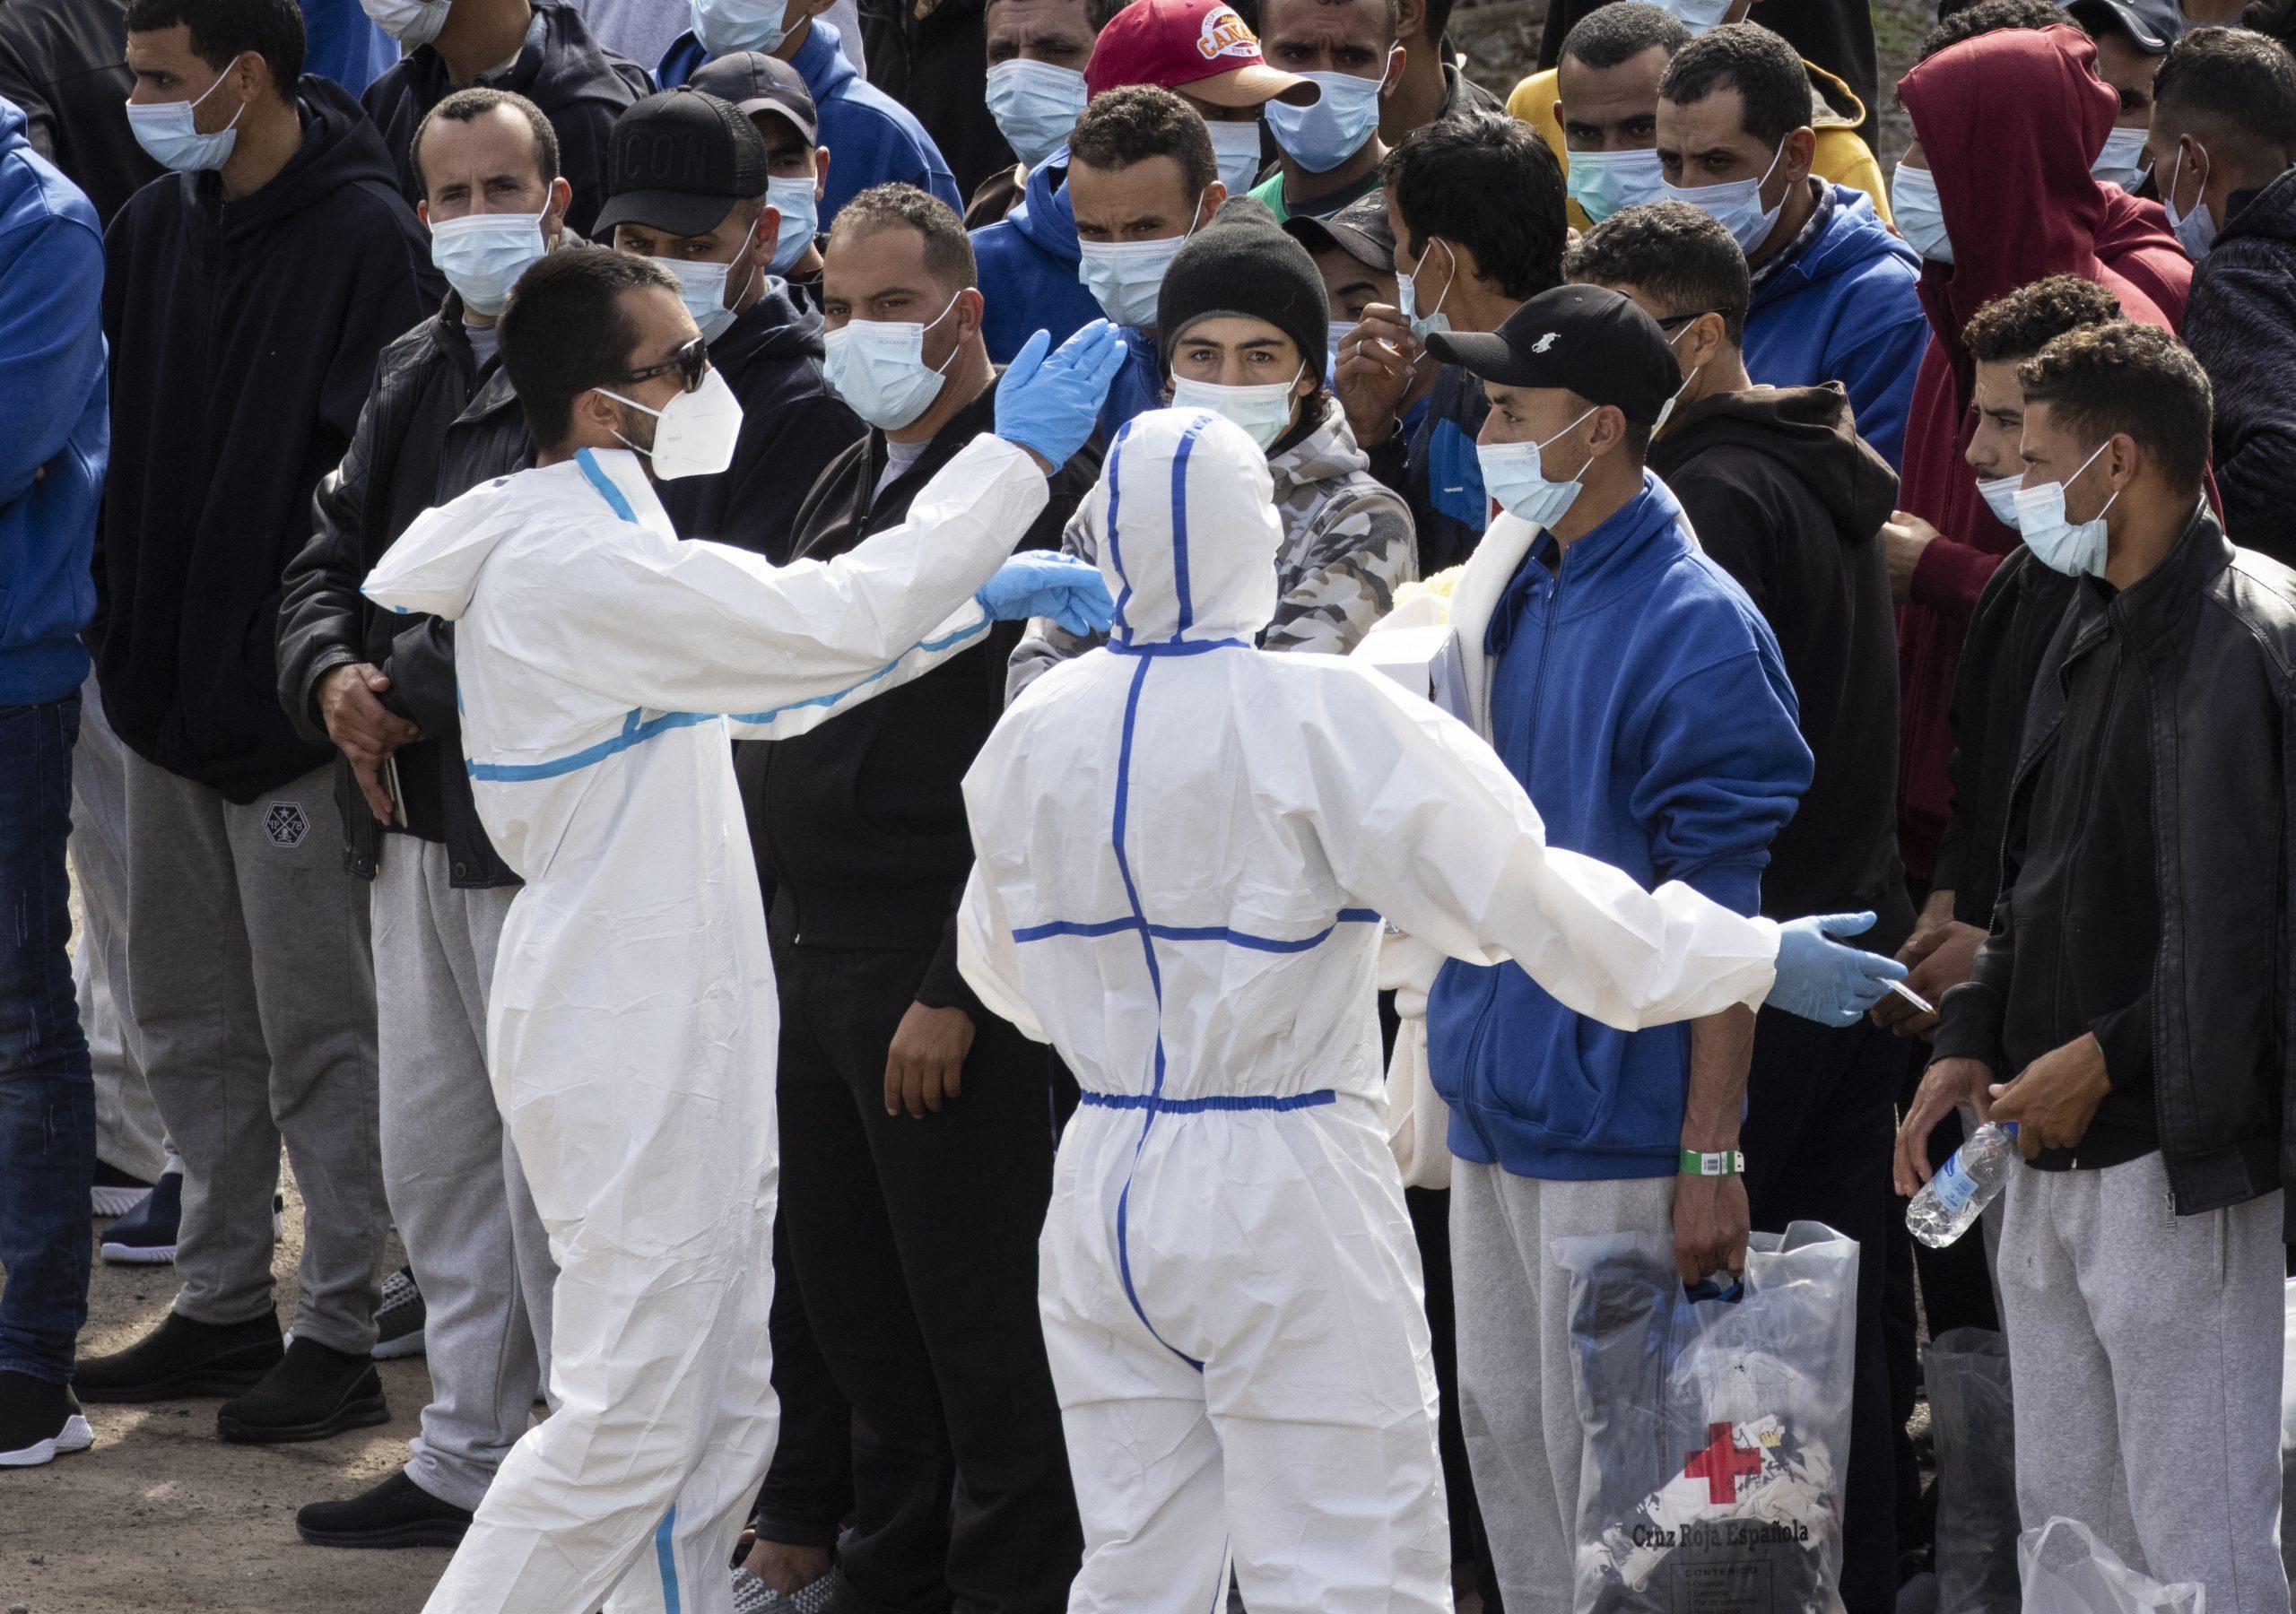 Moria 2.0 auf Gran Canaria? 1.200 Asylbewerber fordern Transfer zum Festland